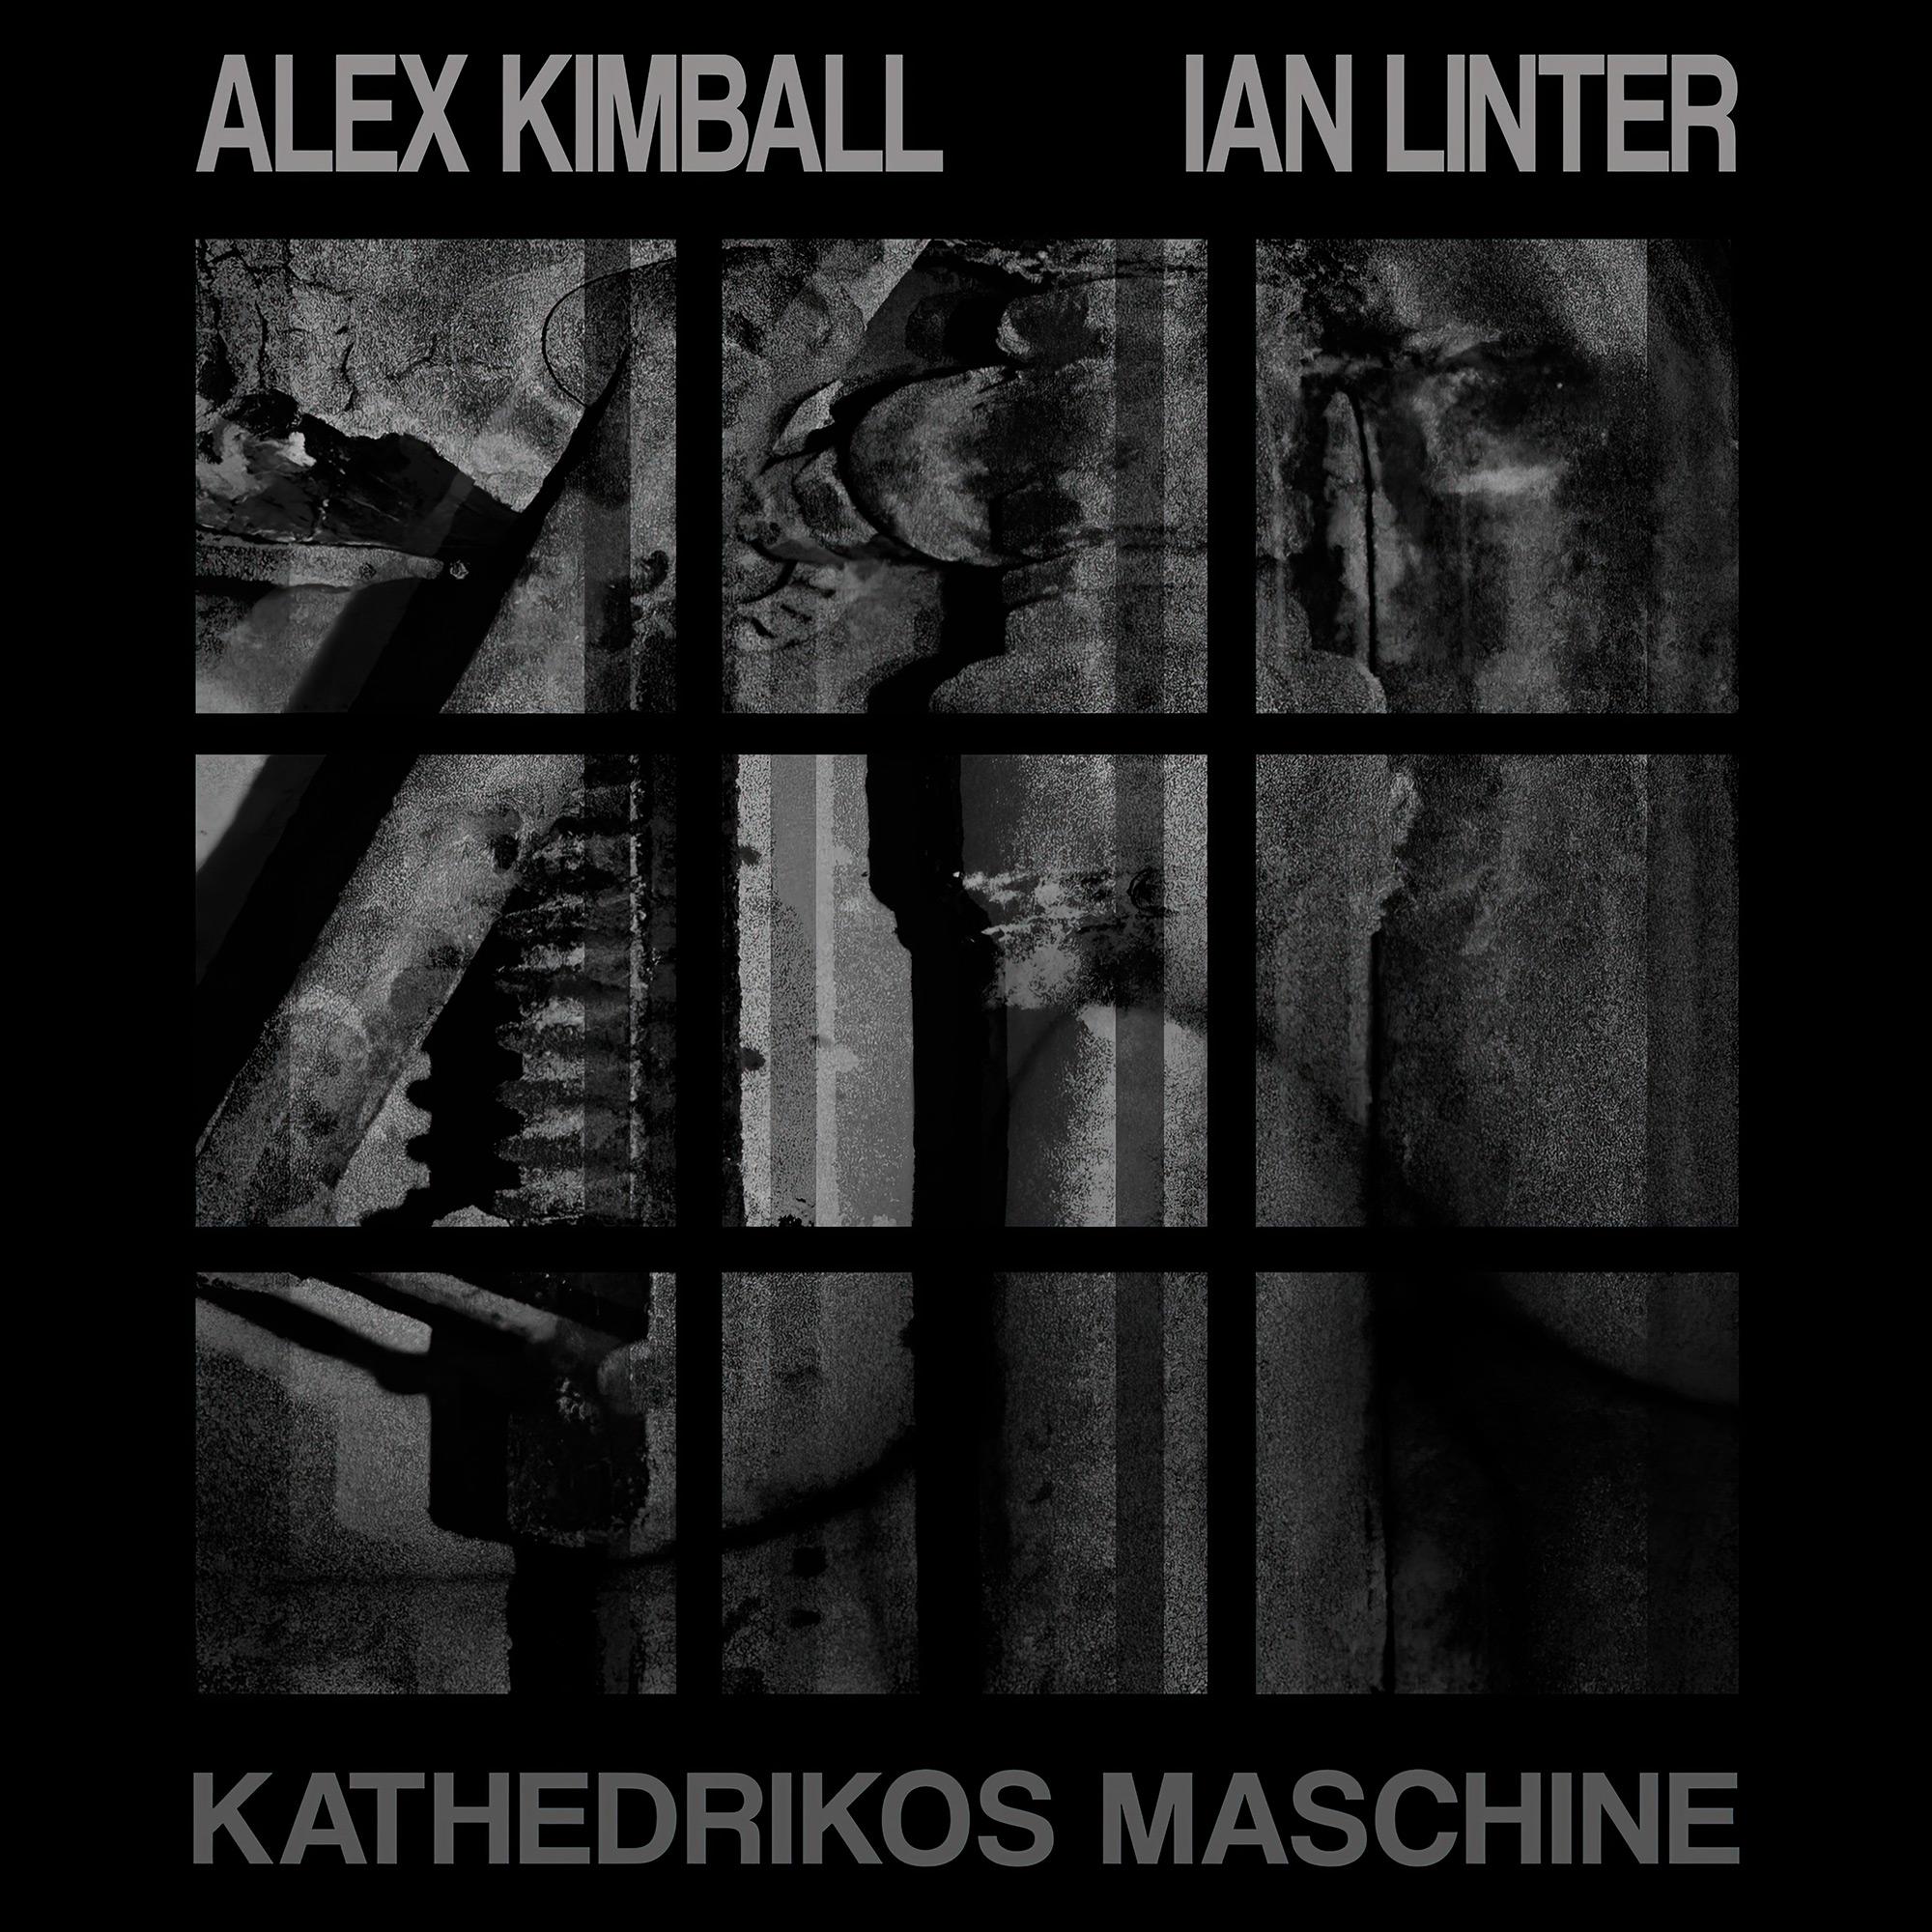 Ian Linter